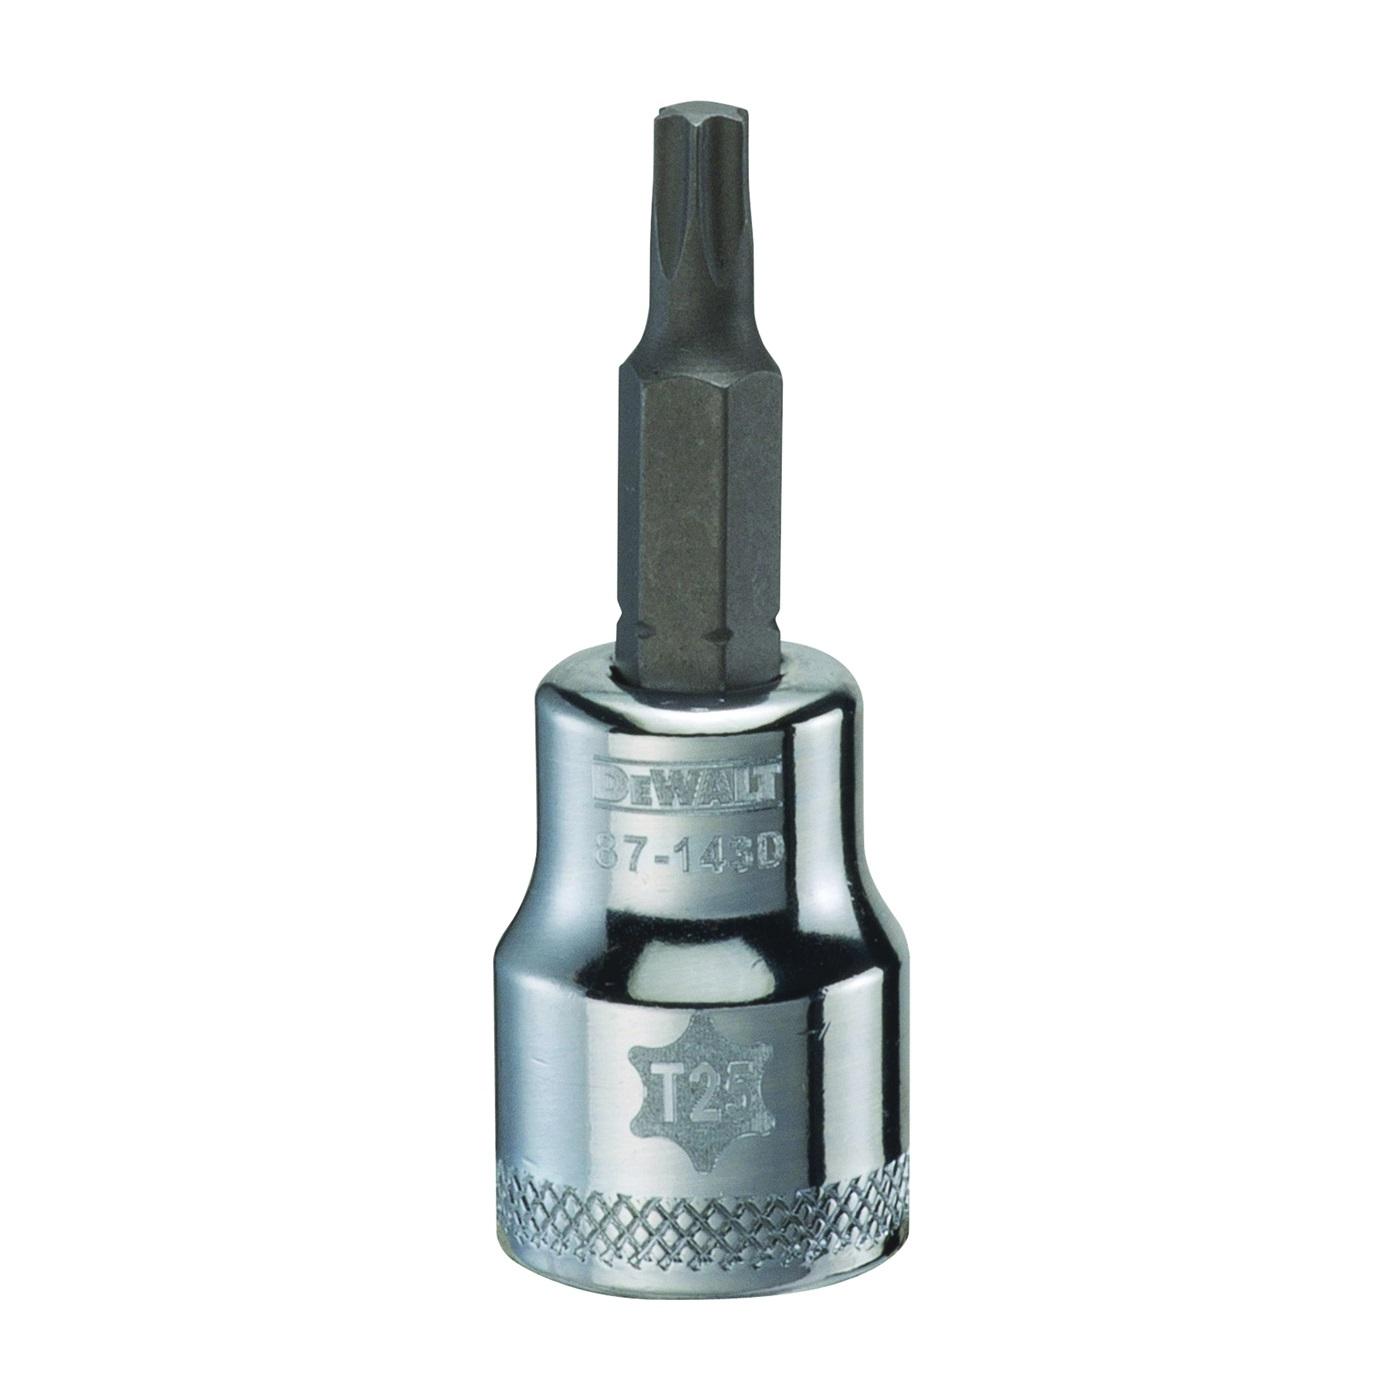 Picture of DeWALT DWMT87143OSP Torx Bit Socket, T25 Tip, 3/8 in Drive, Polished Chrome Vanadium